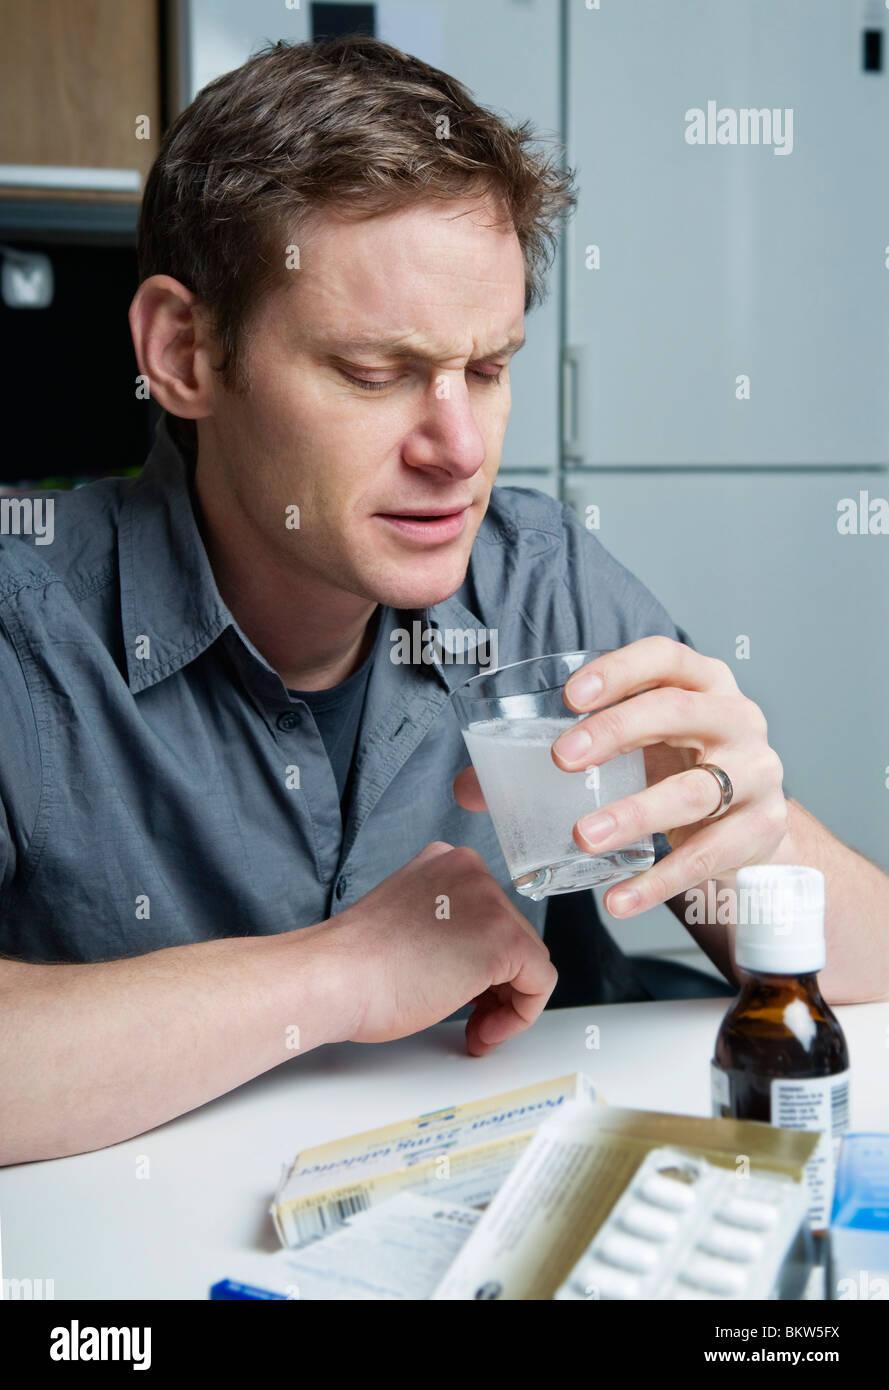 Man with medicine - Stock Image